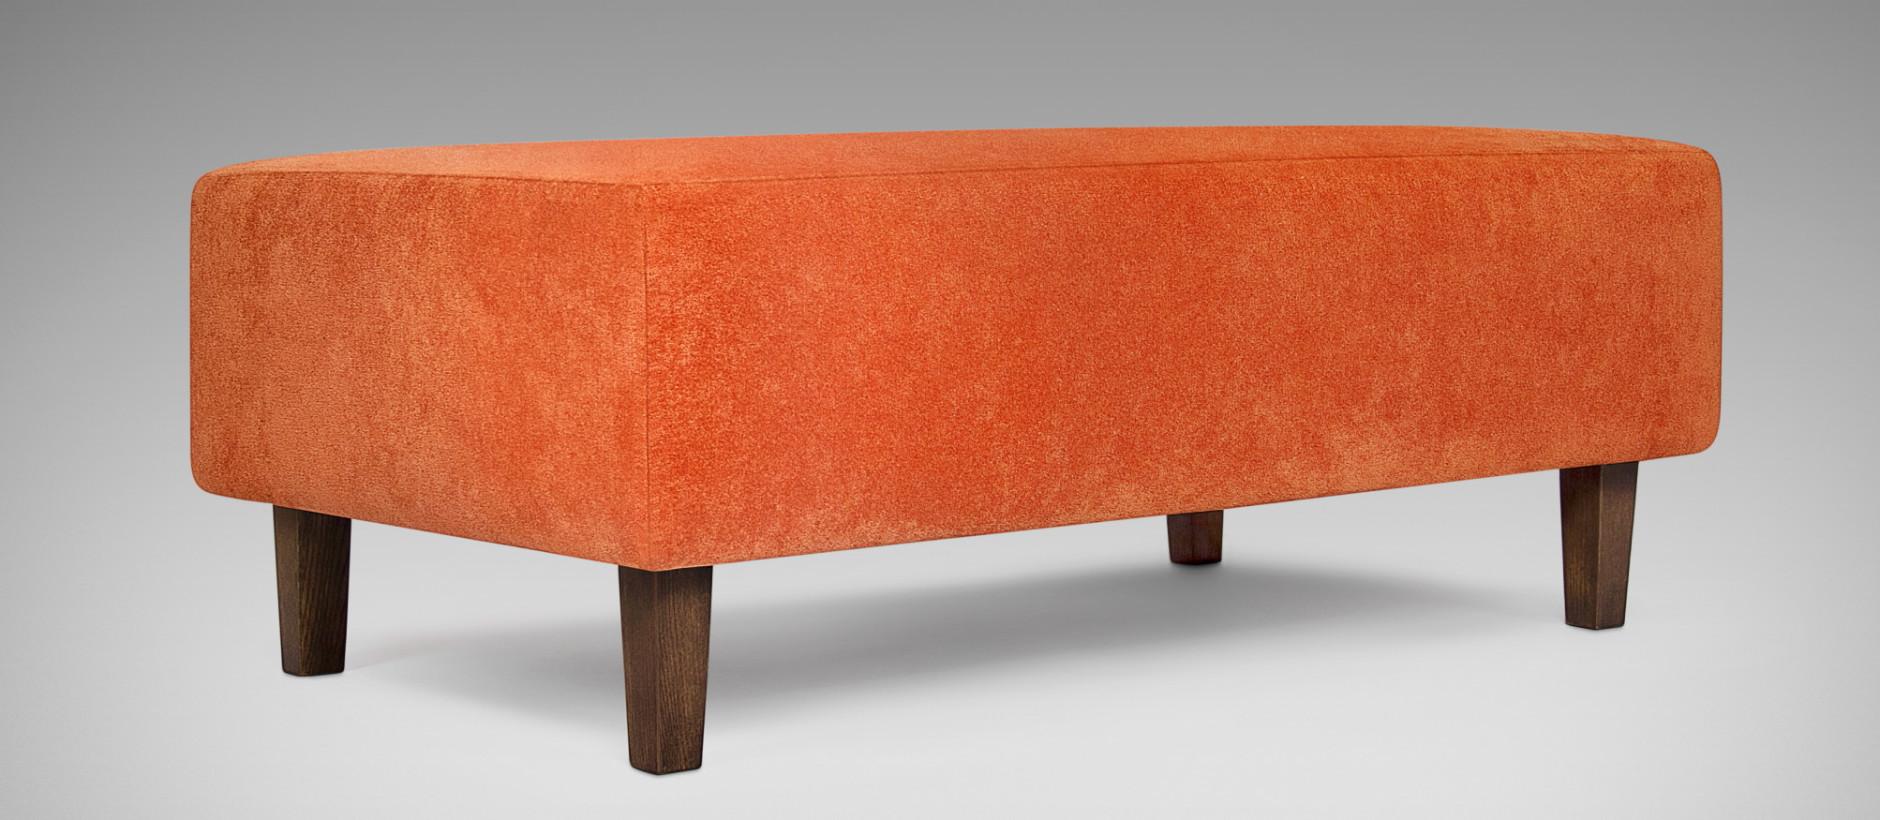 Custom made designer ottomans the world 39 s best fitting for Best furniture designers in the world